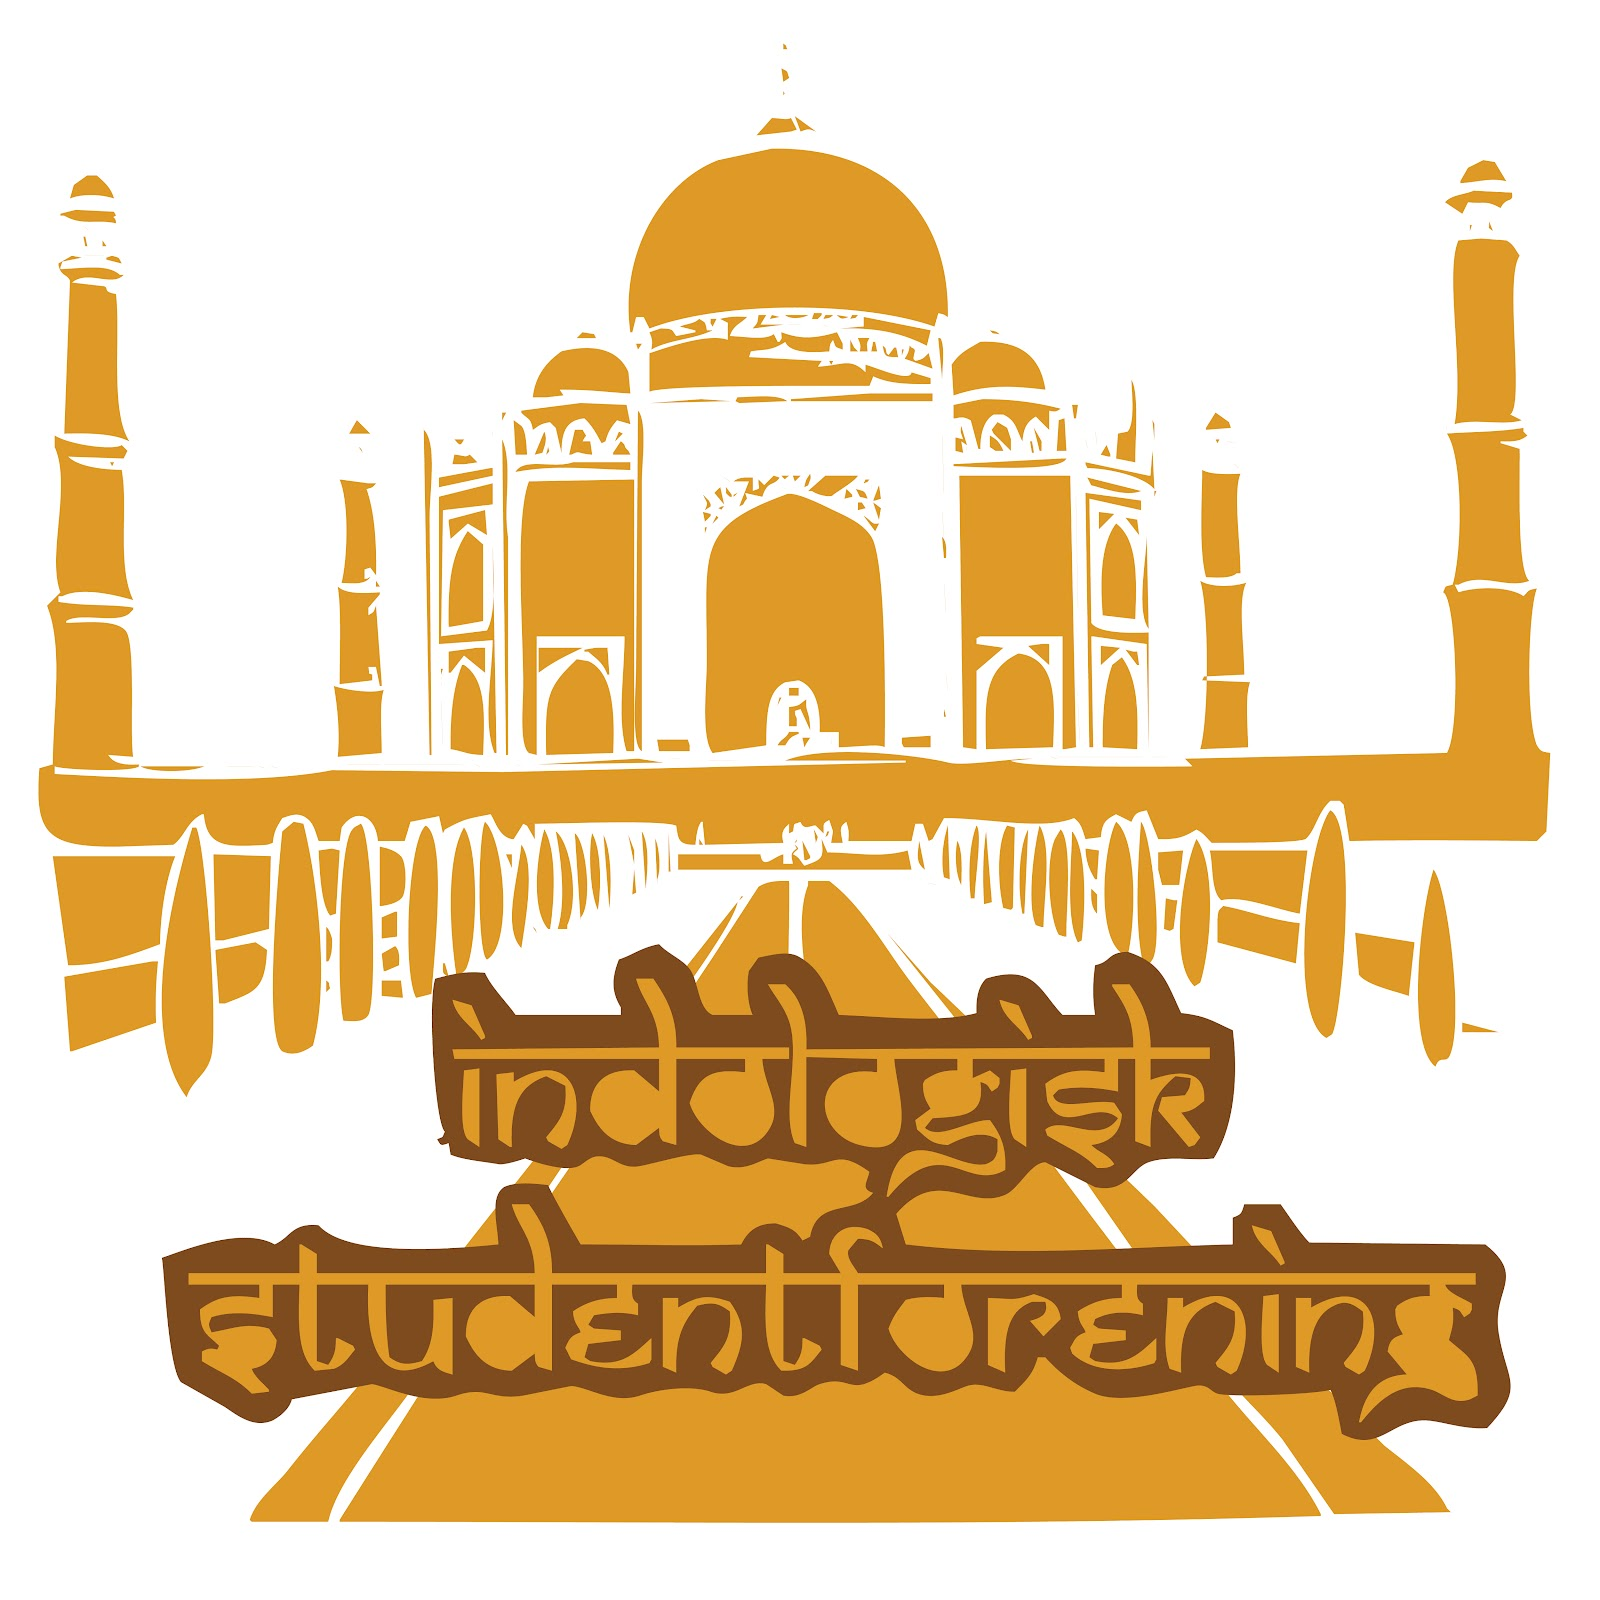 Indologisk studentforening